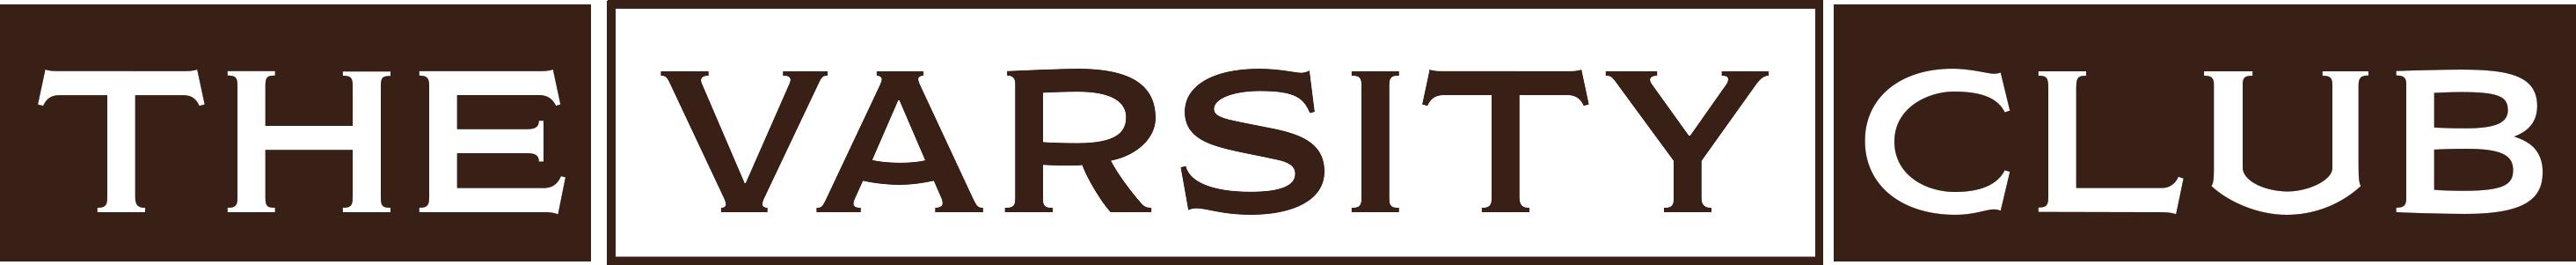 TheVarsityClub_Logo